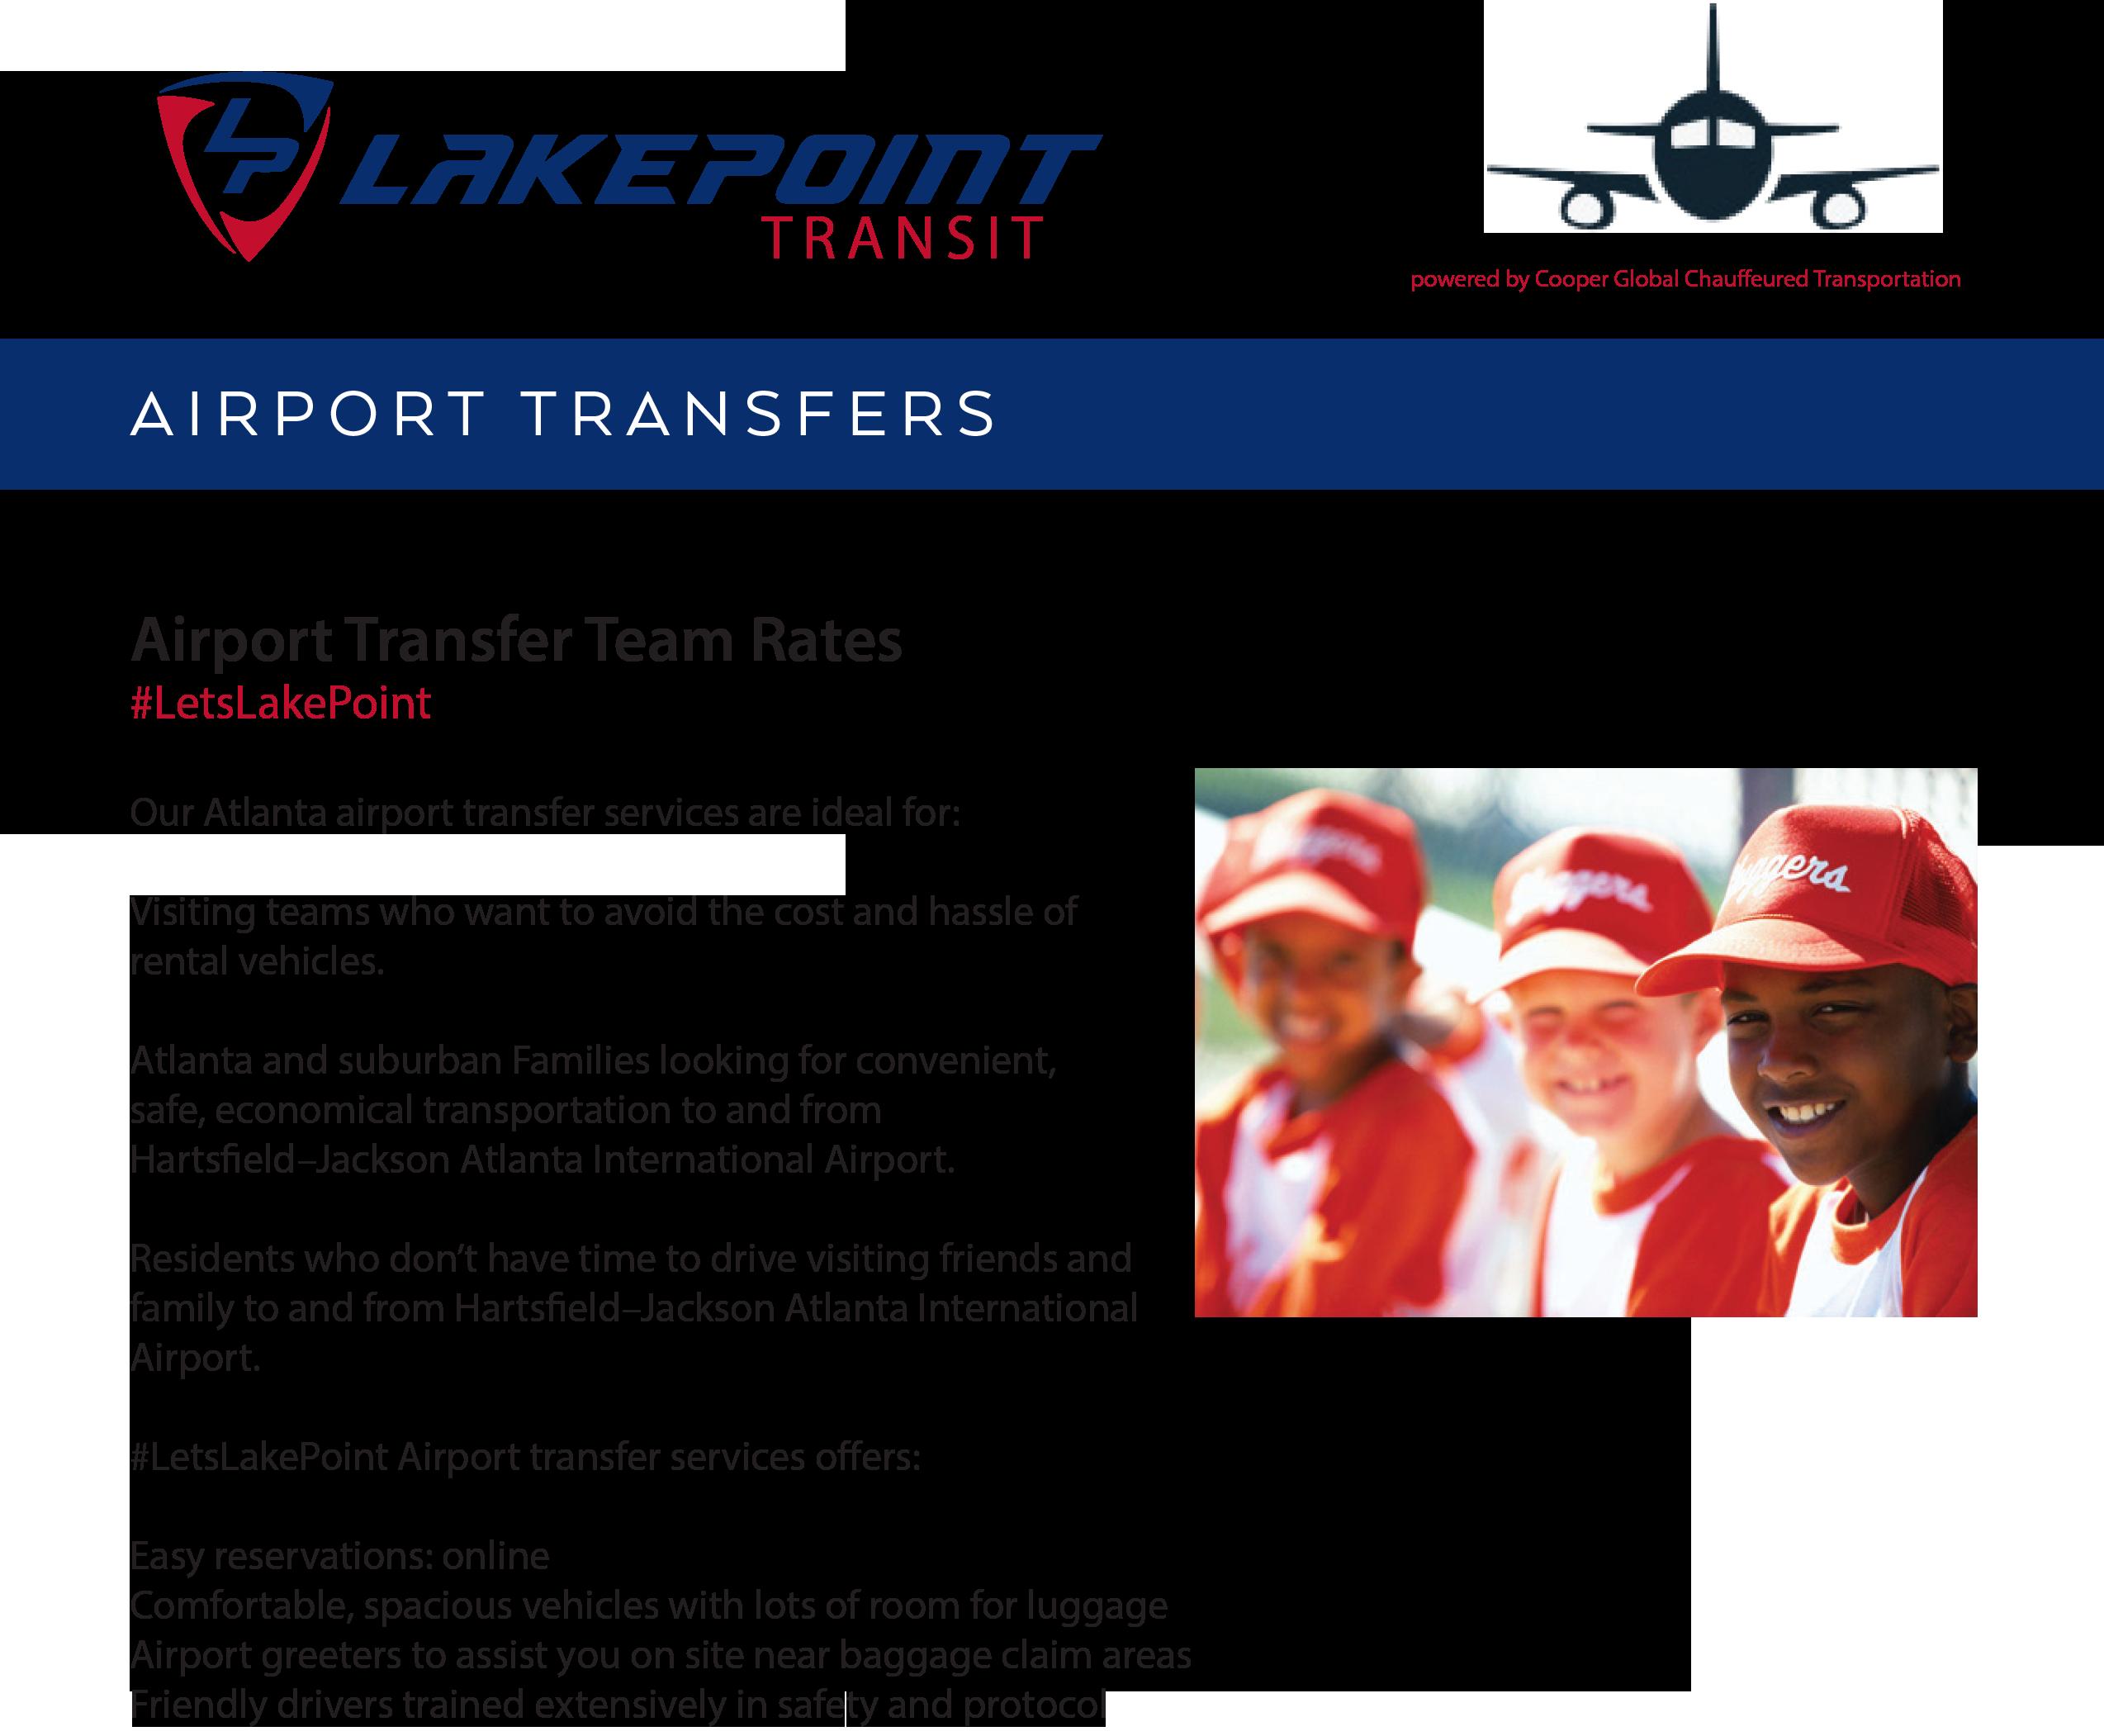 LP_Transit_Services_Draft V(1.1)_05262015_CF-2